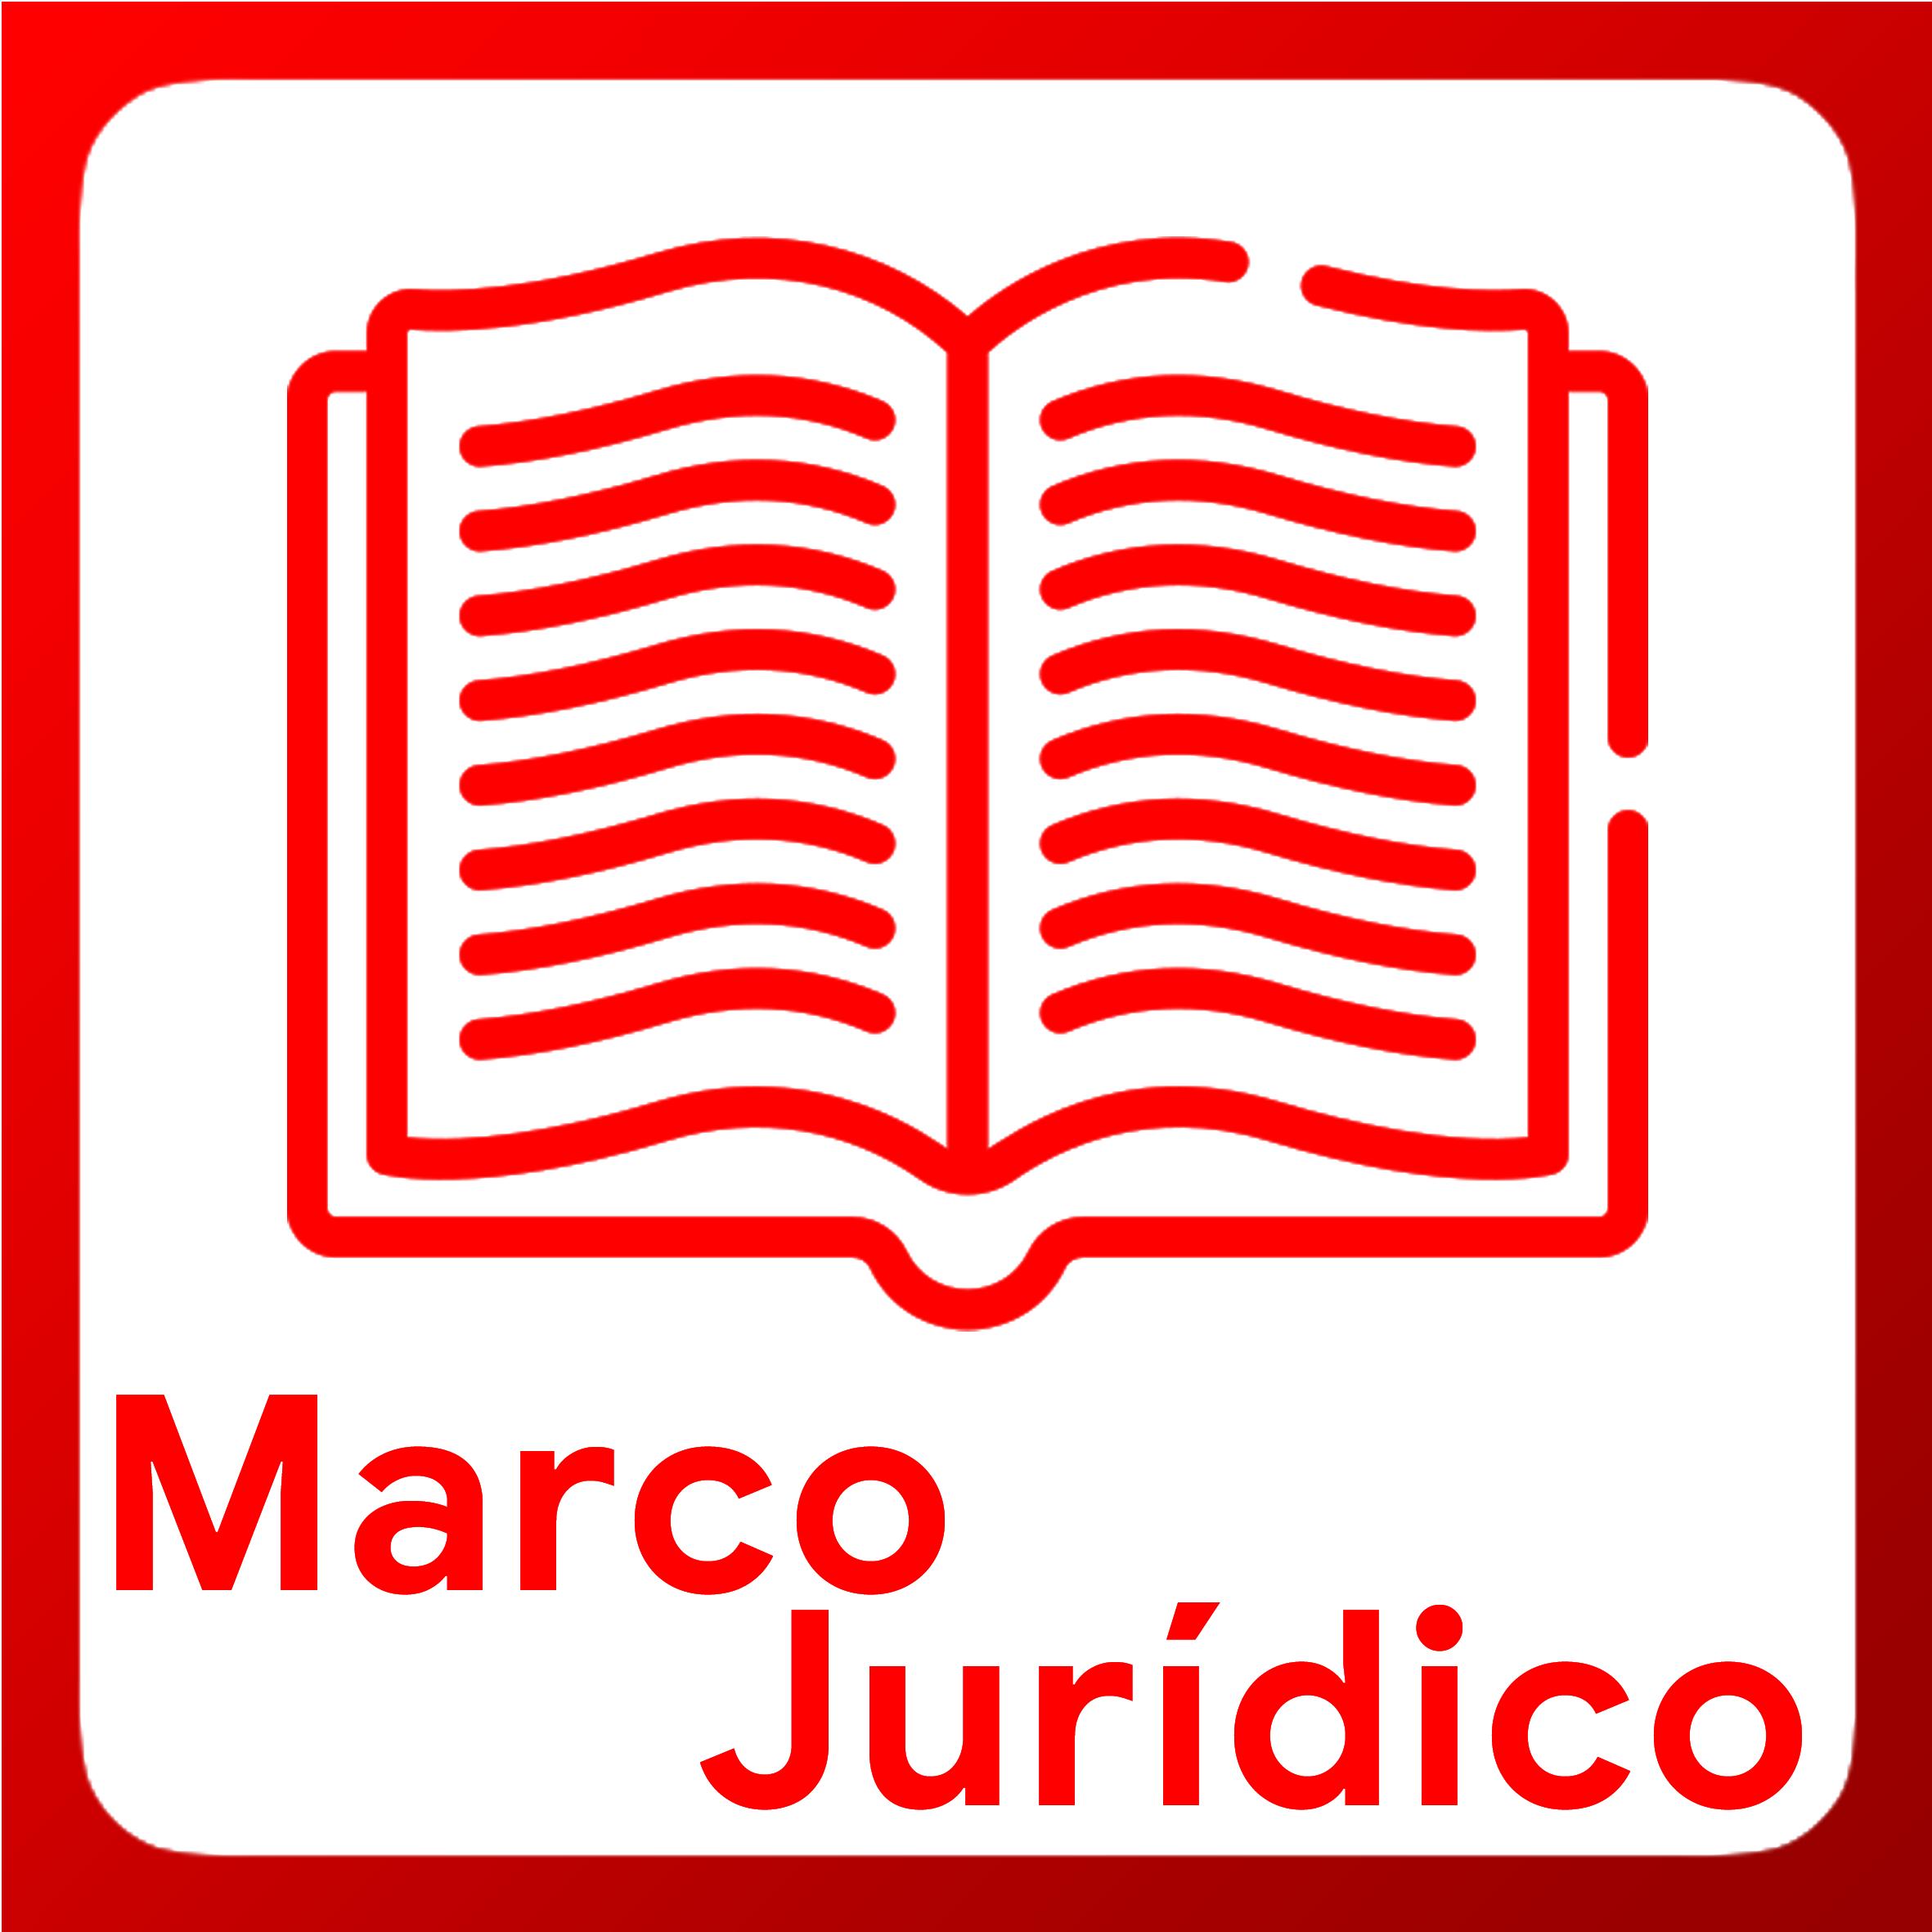 Boton activable de Marco jurídico